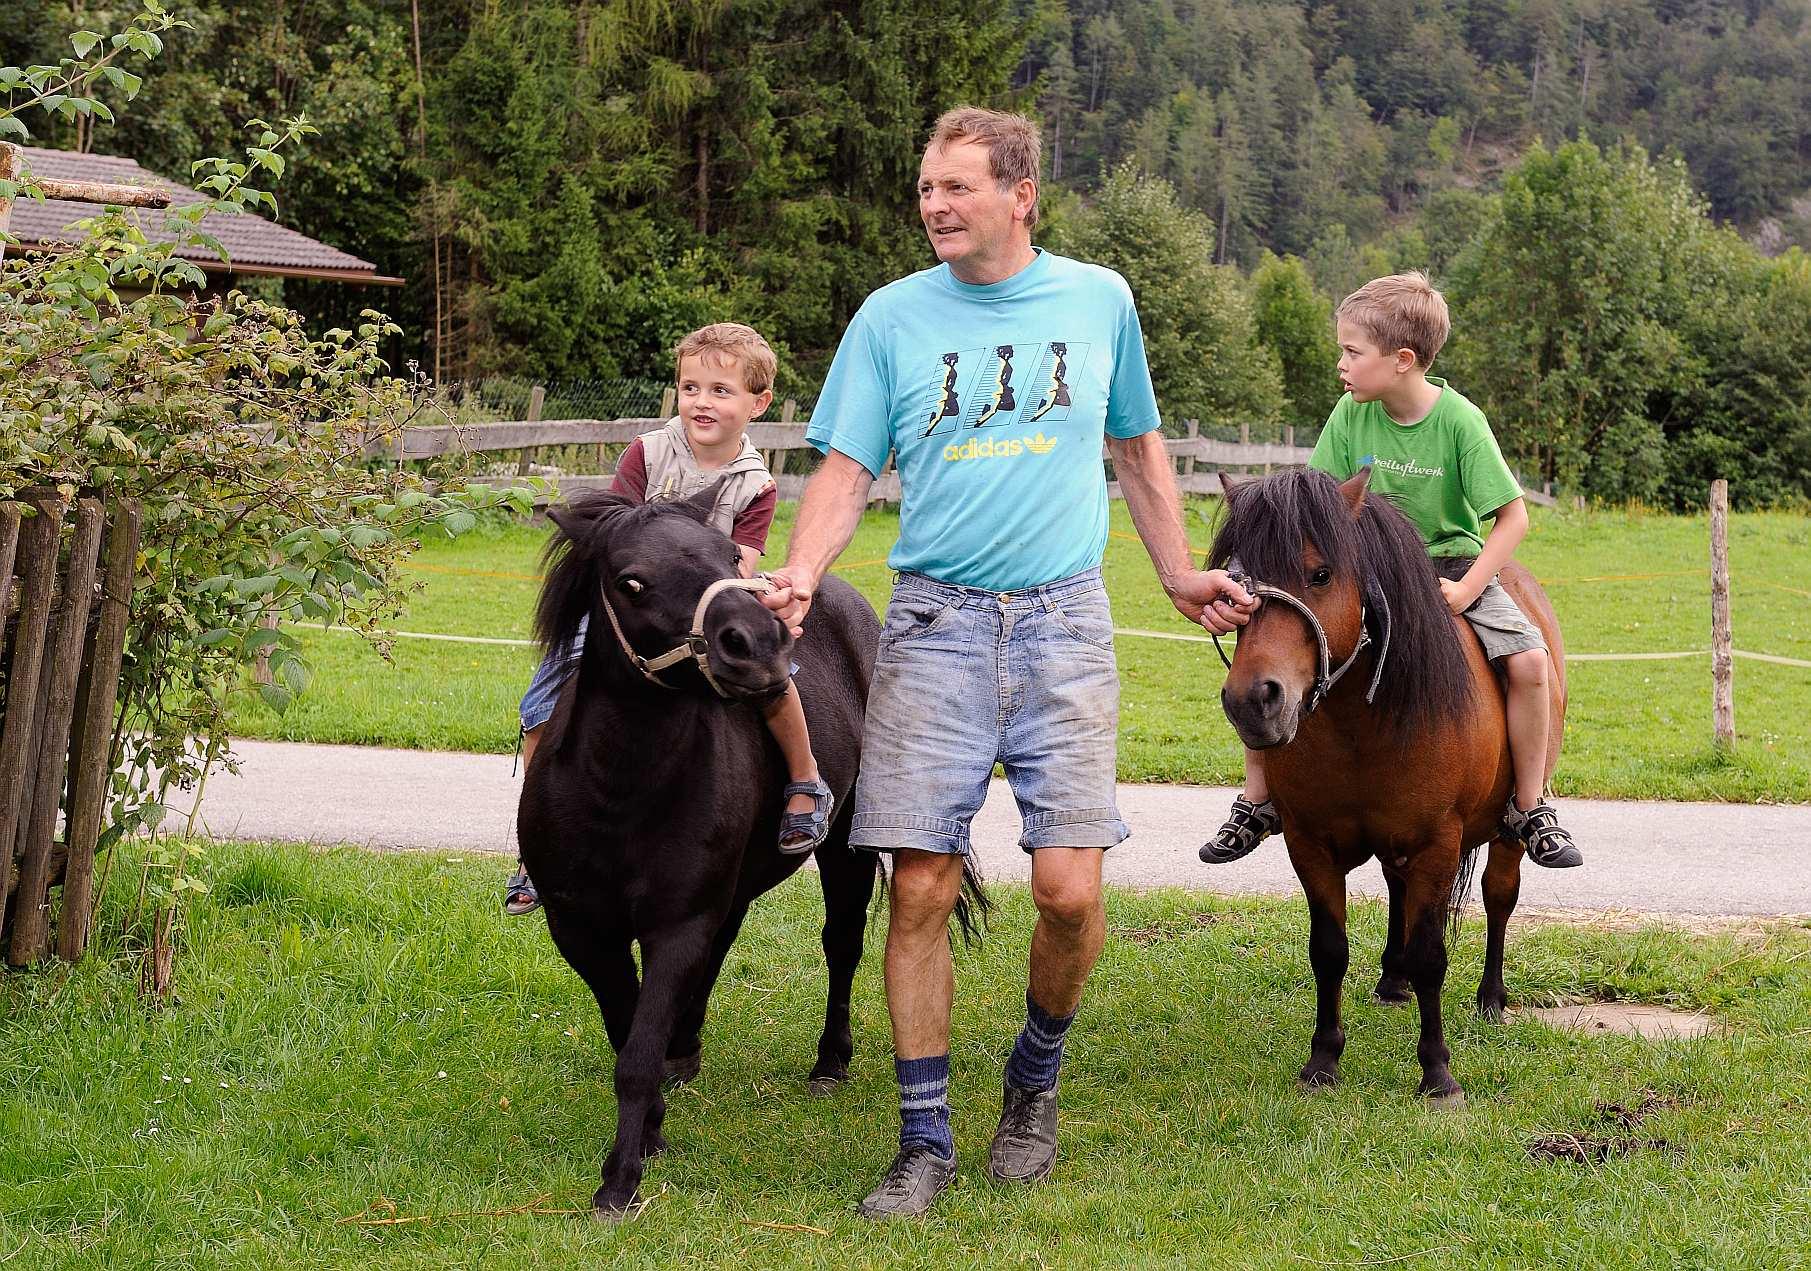 Ponys, Zwergziegen, Kälbchen, Kühe, Hühner, Hasen, Enten, Katzen.